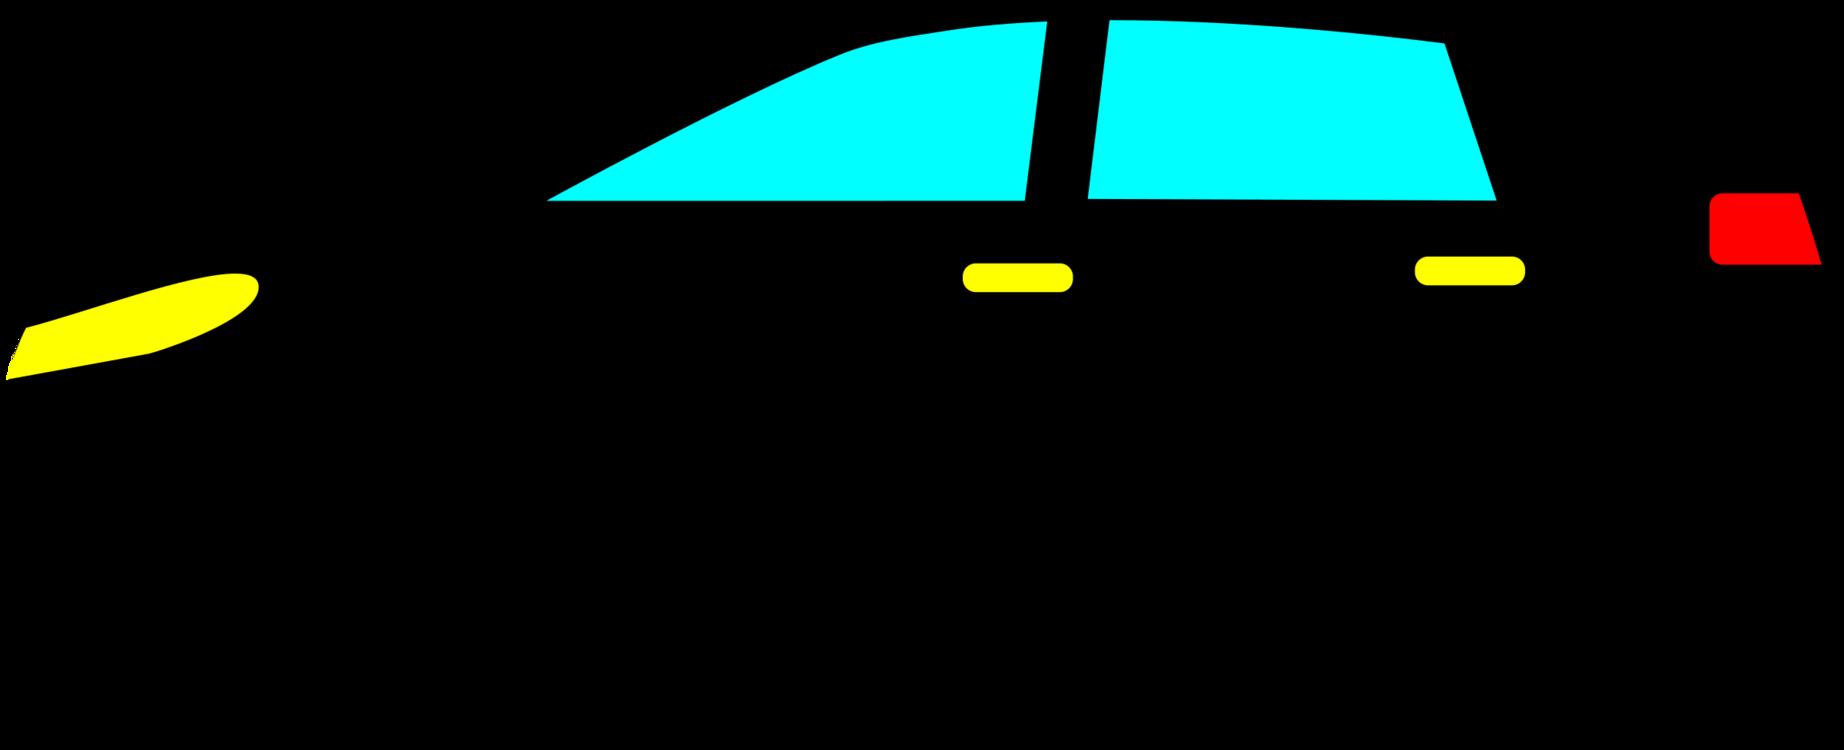 Compact Car,Area,Car PNG Clipart.